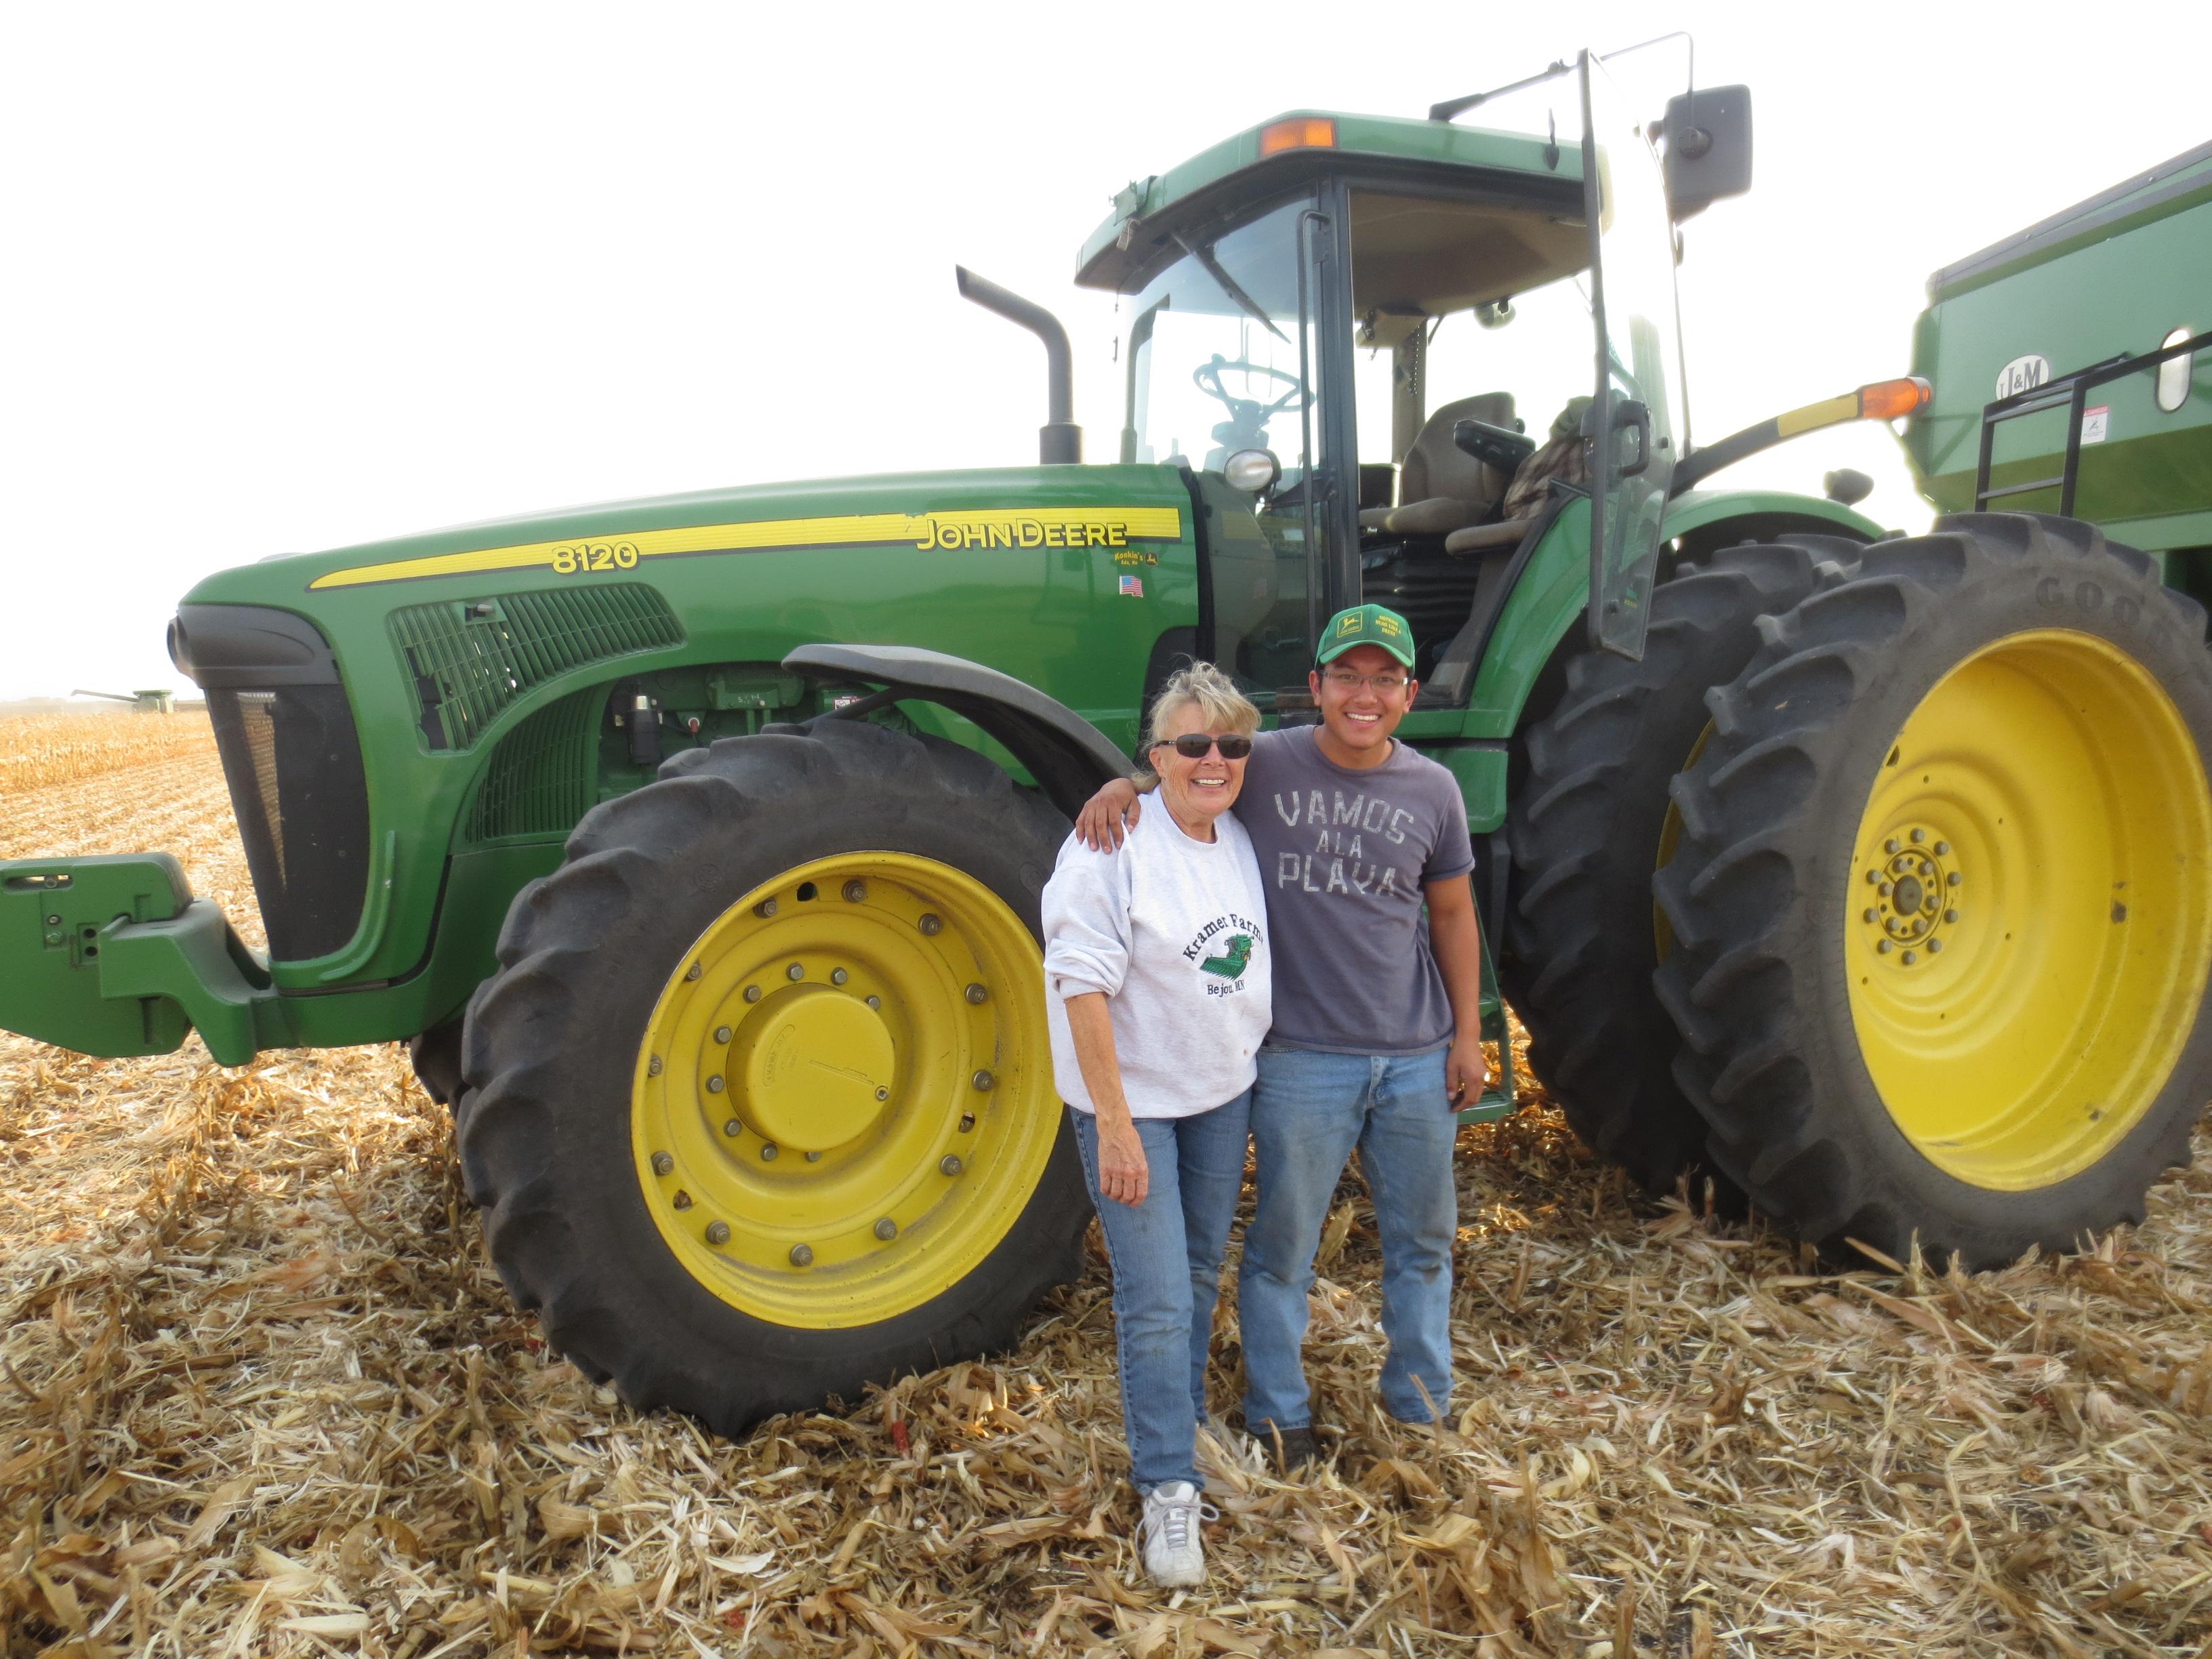 2012.09 visit Kramer Farms-intern Tanno Guilherme